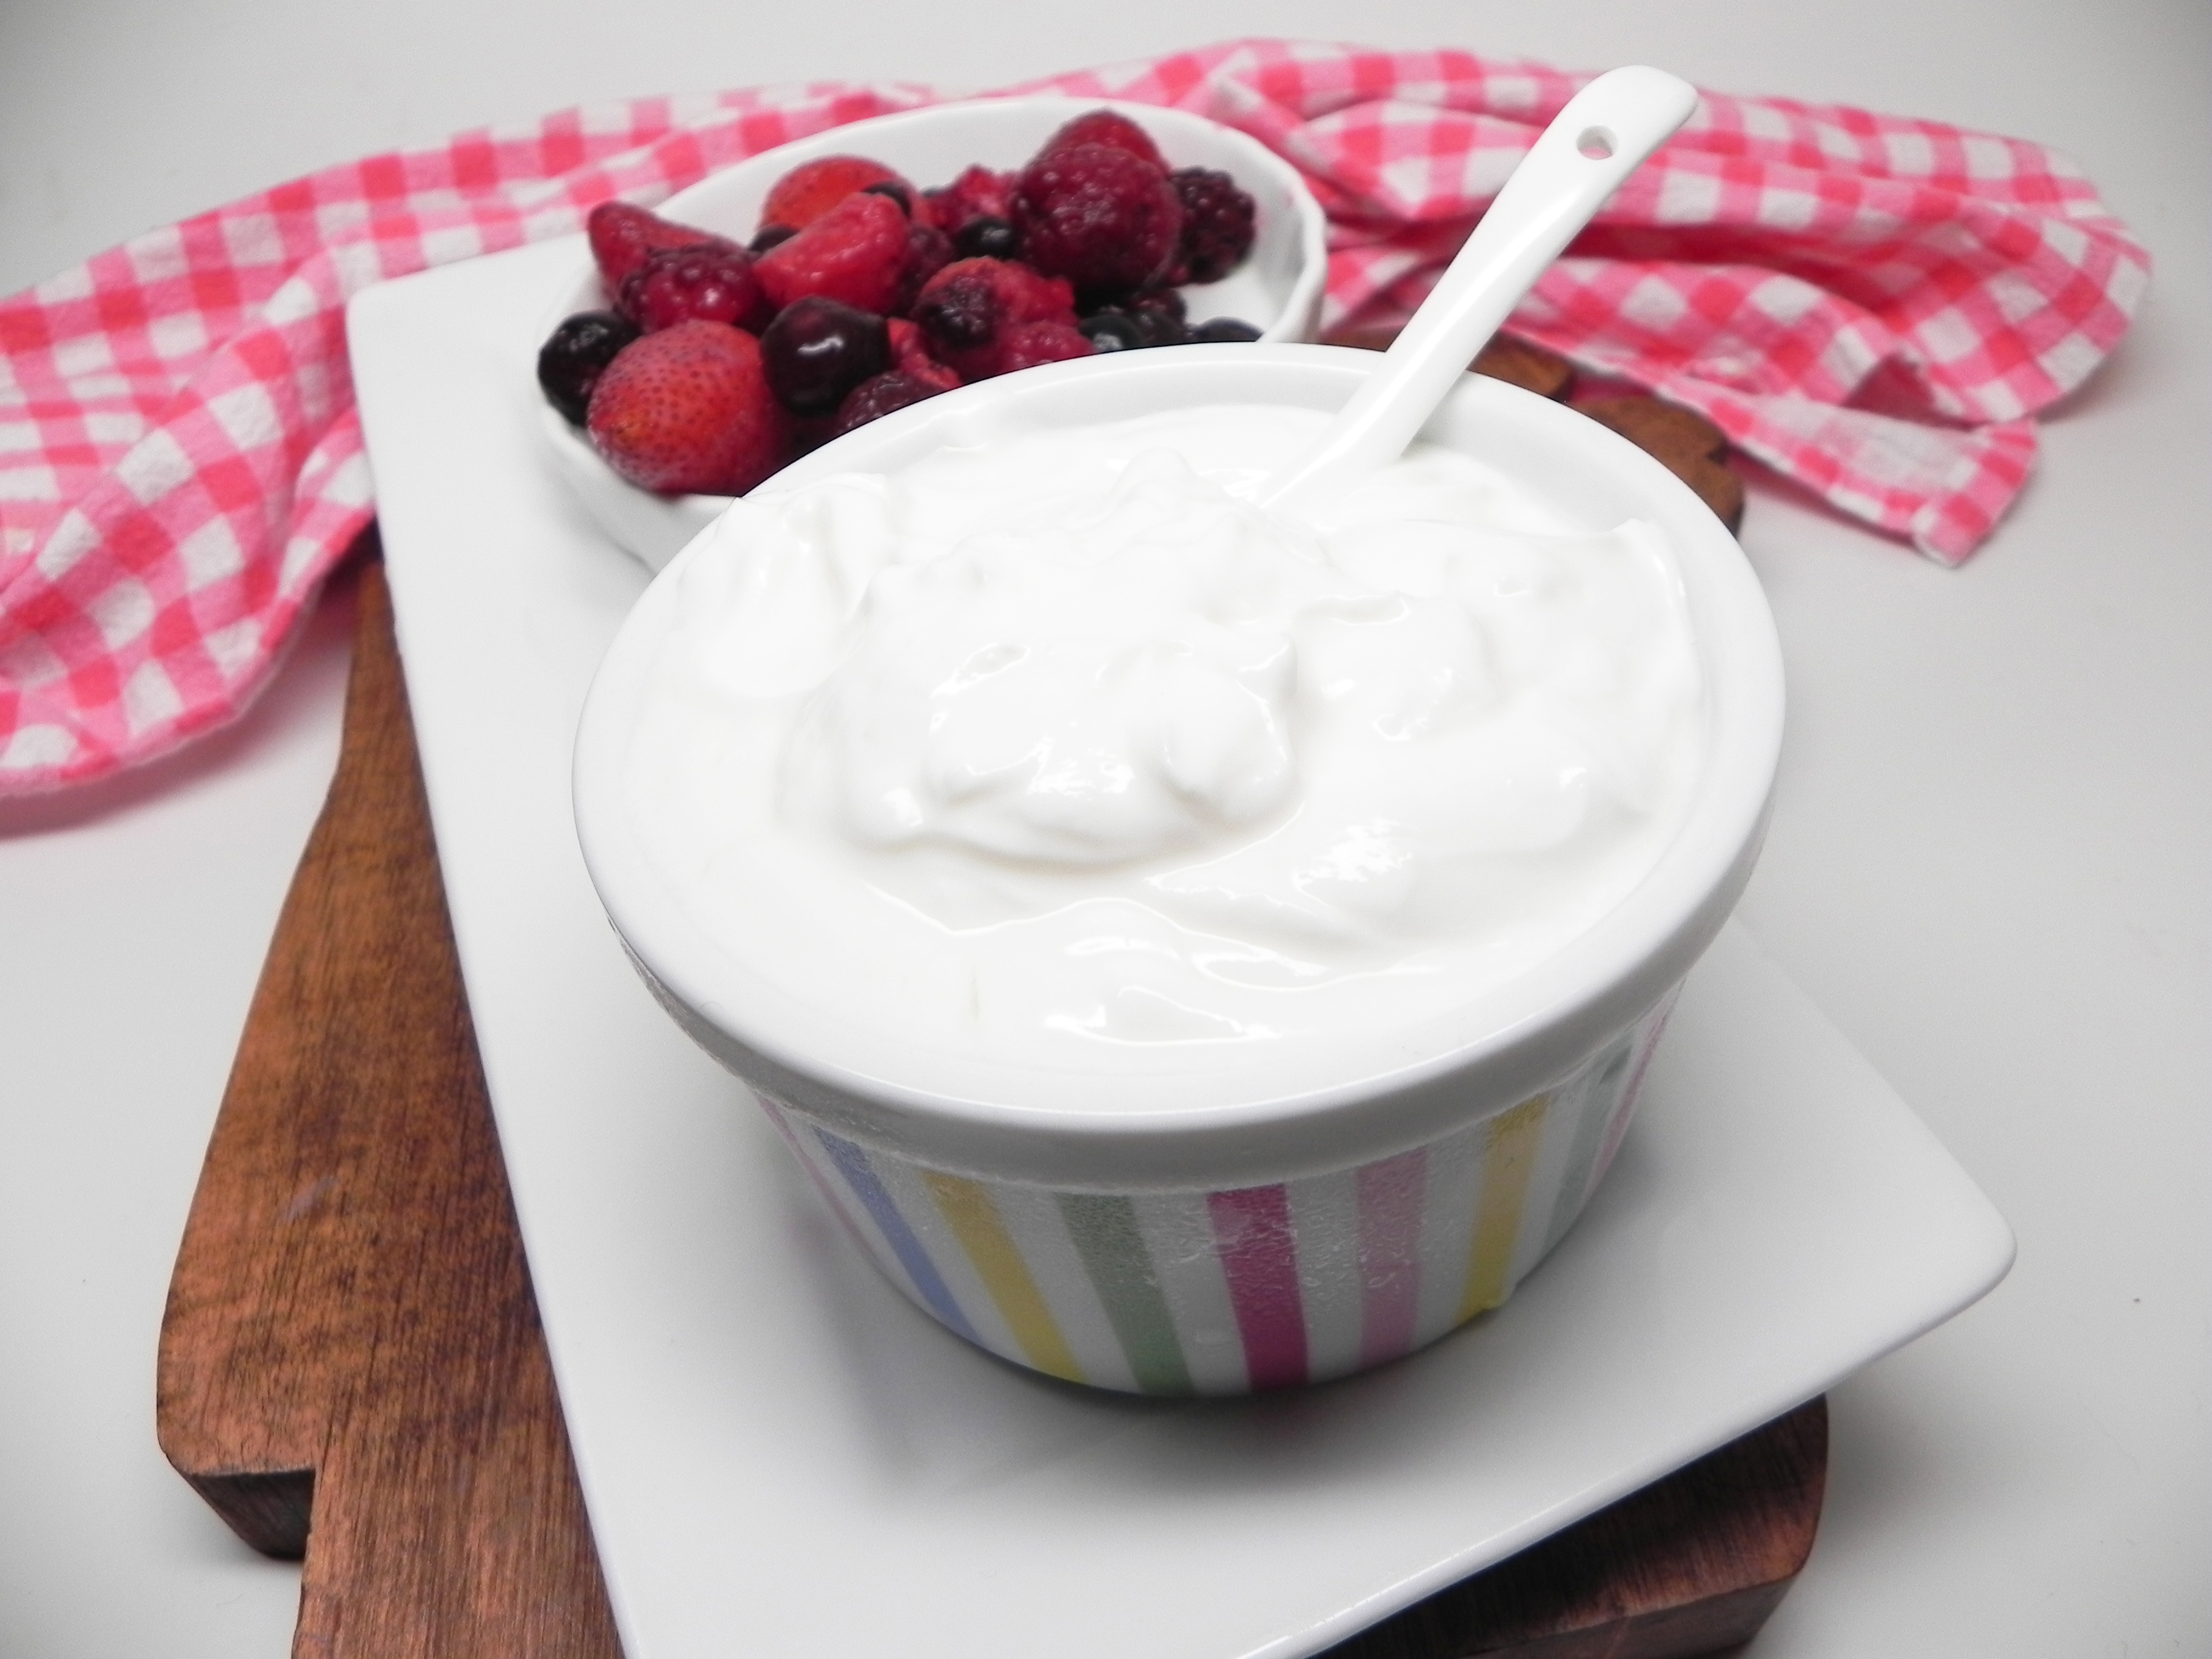 Homemade Greek Yogurt In Your Slow Cooker